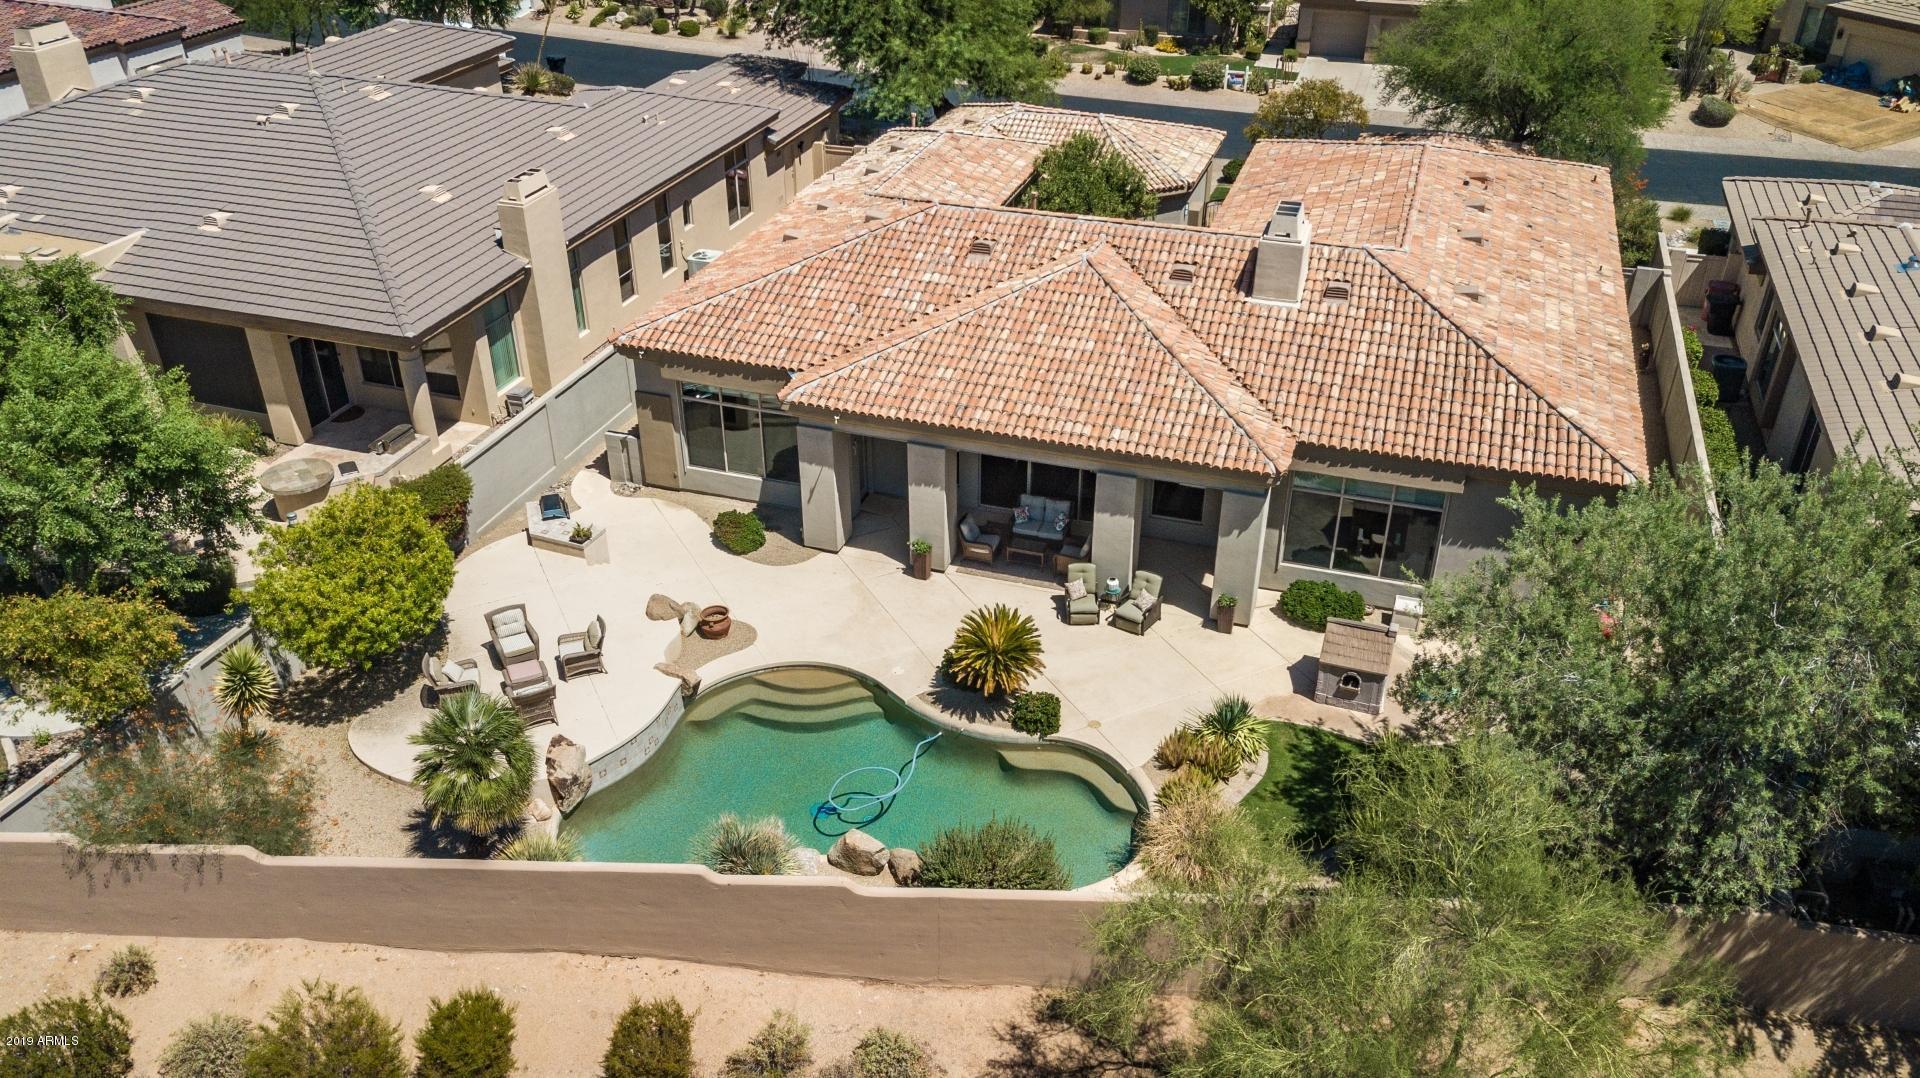 MLS 5967670 20626 N 83RD Place, Scottsdale, AZ 85255 Scottsdale AZ Private Pool